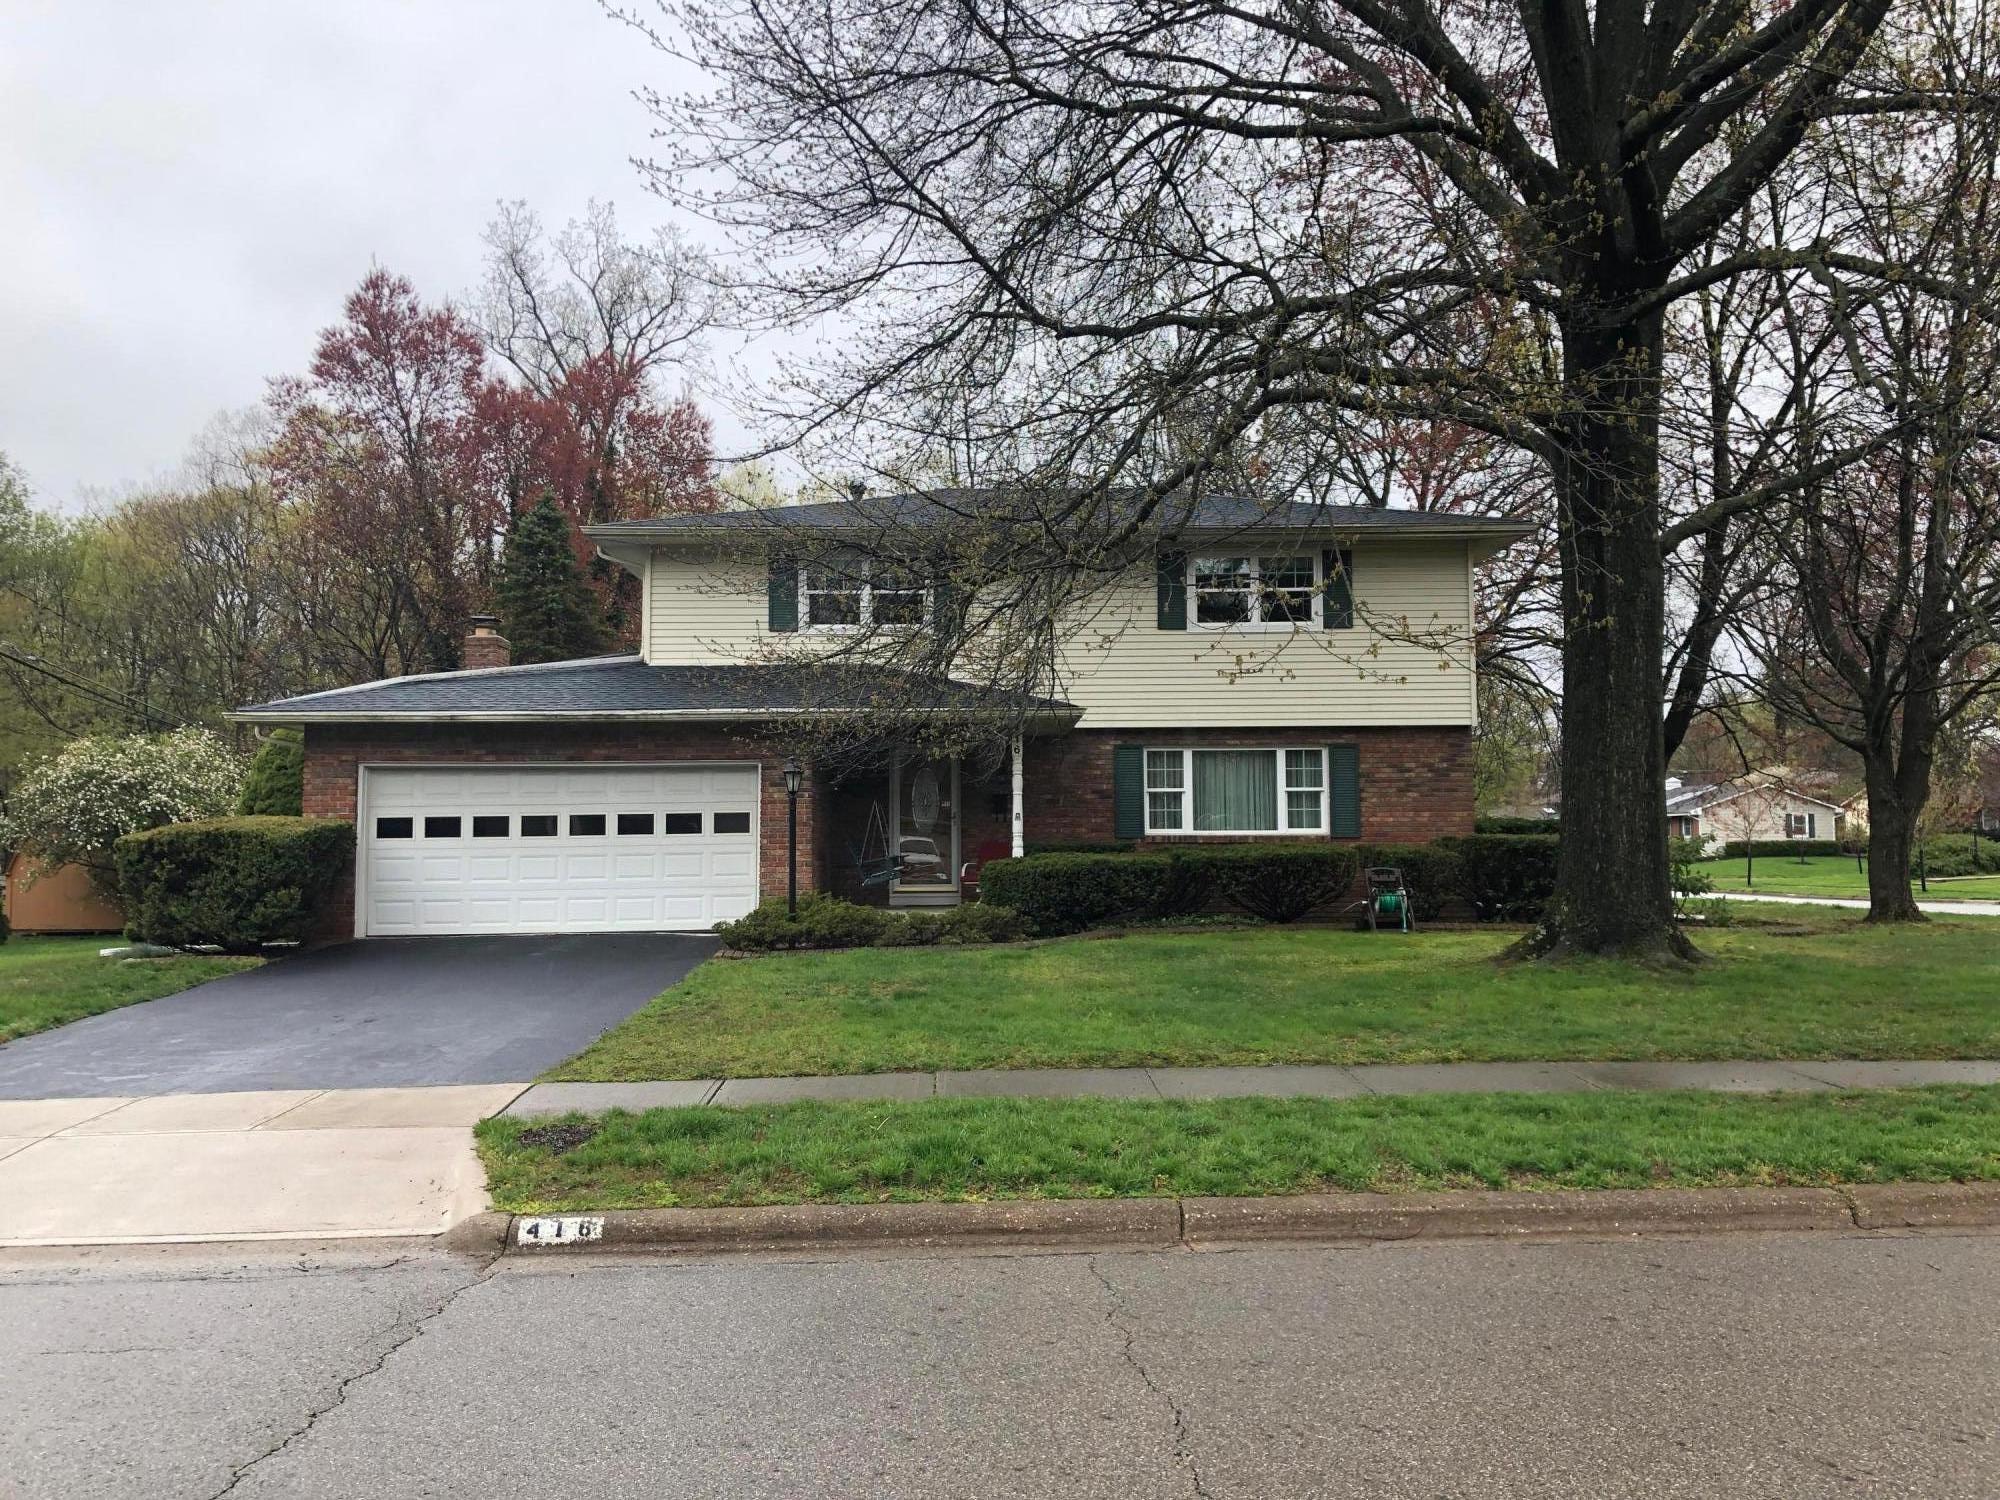 Photo of 416 Haymore Avenue N, Worthington, OH 43085